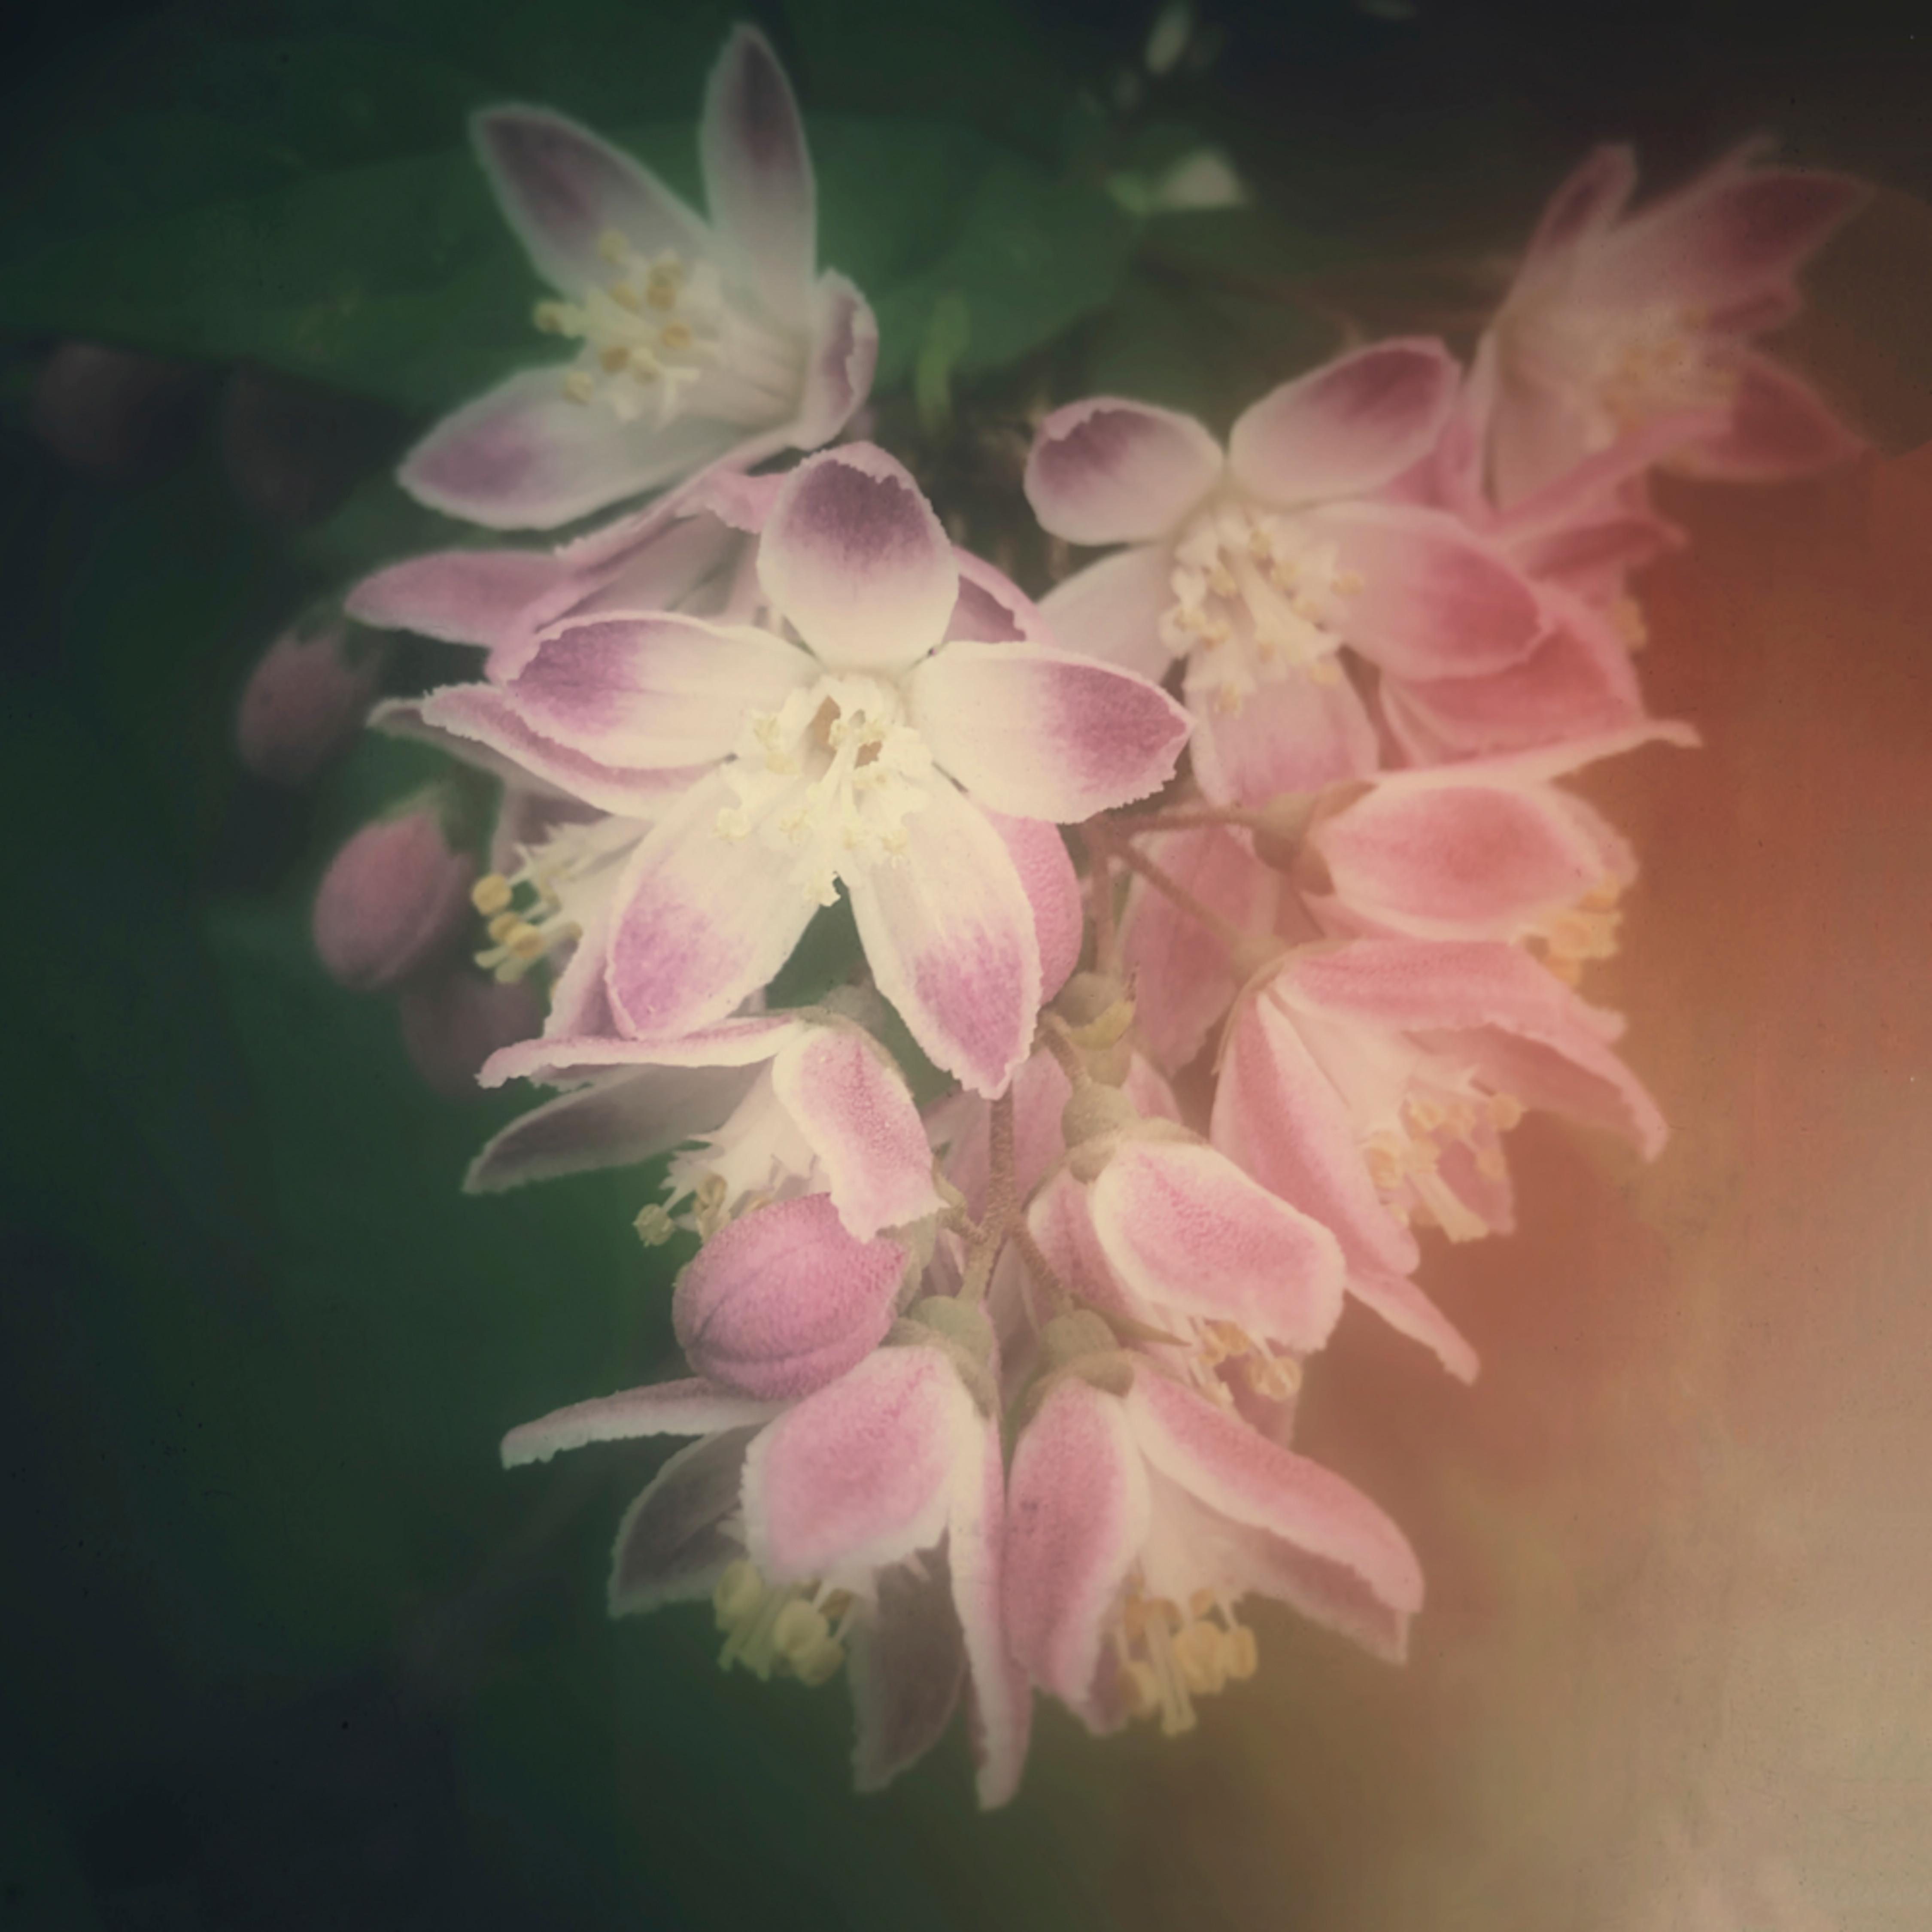 Pink cluster blooms vdbibs